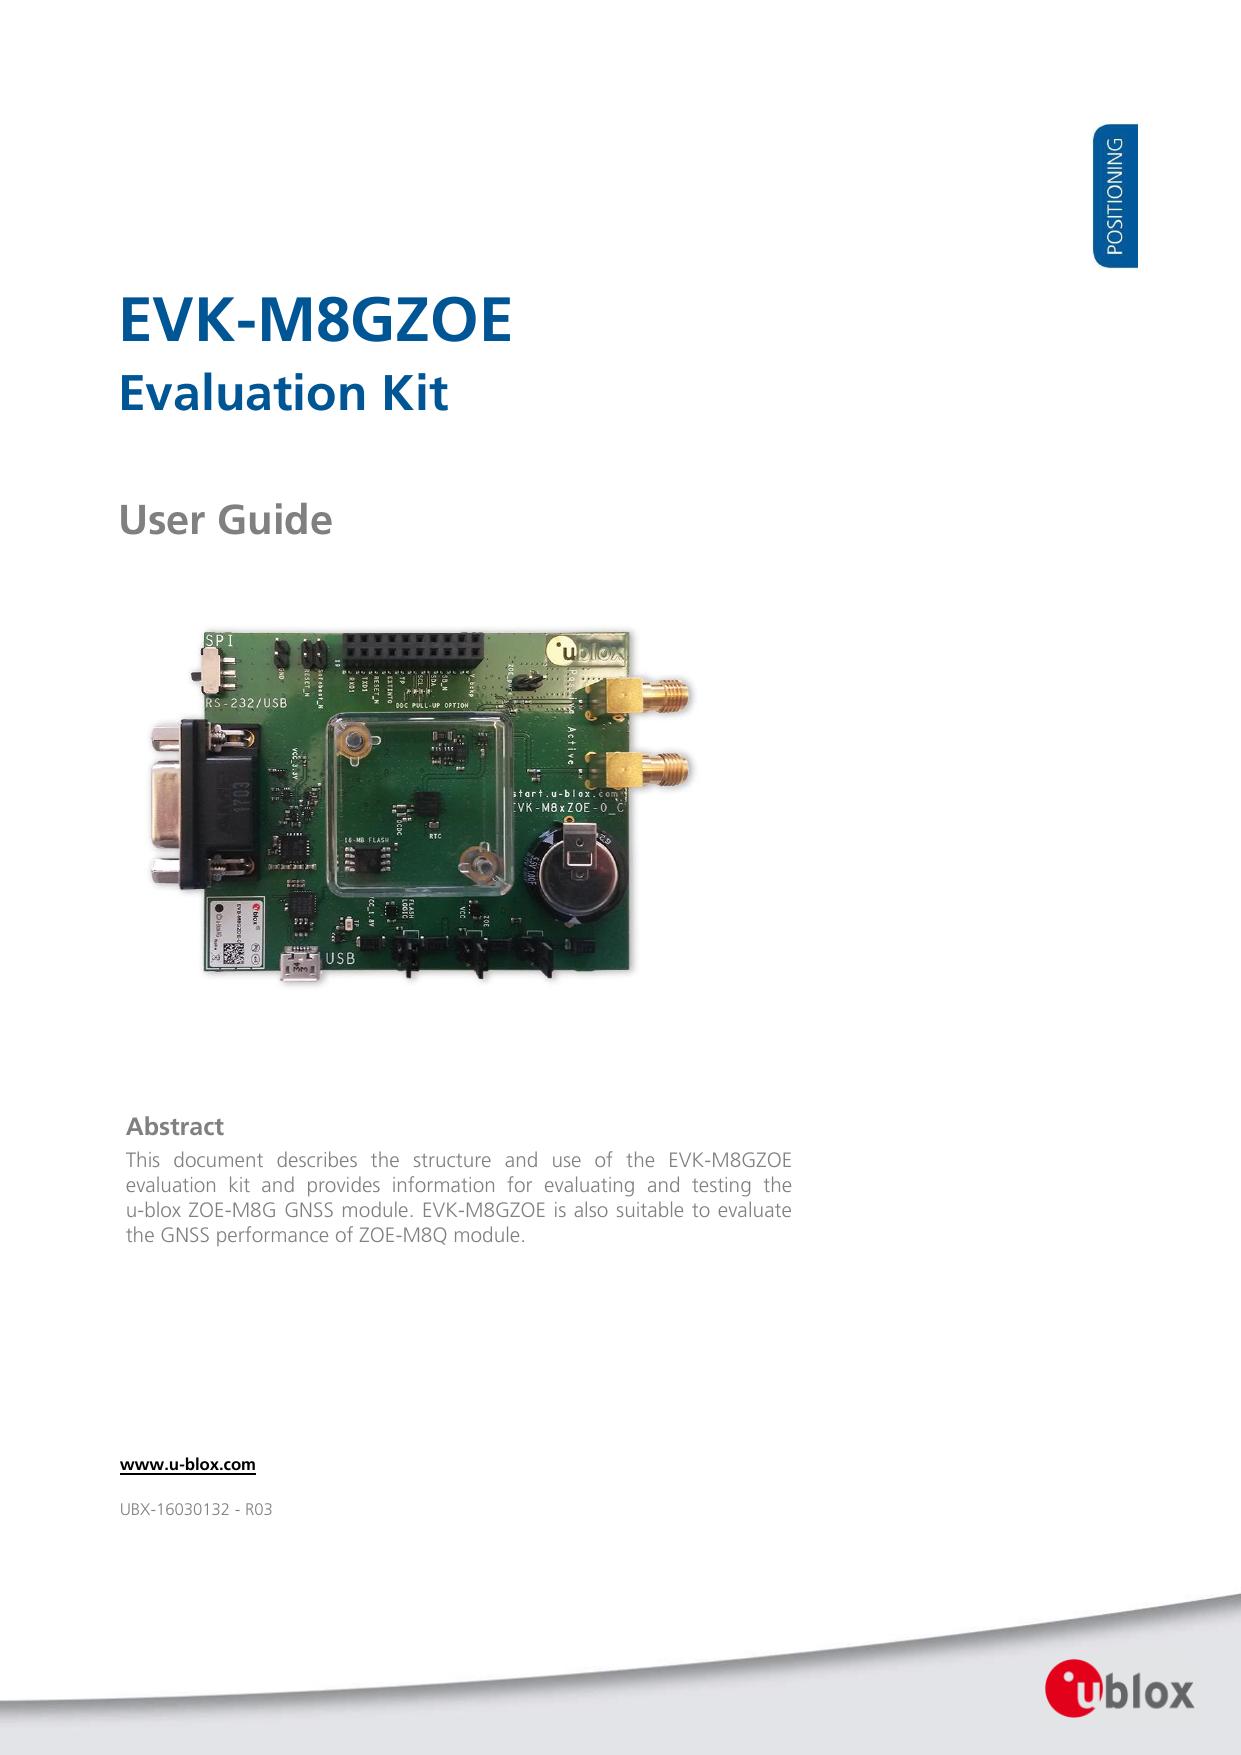 EVK-M8GZOE - u-blox | manualzz com